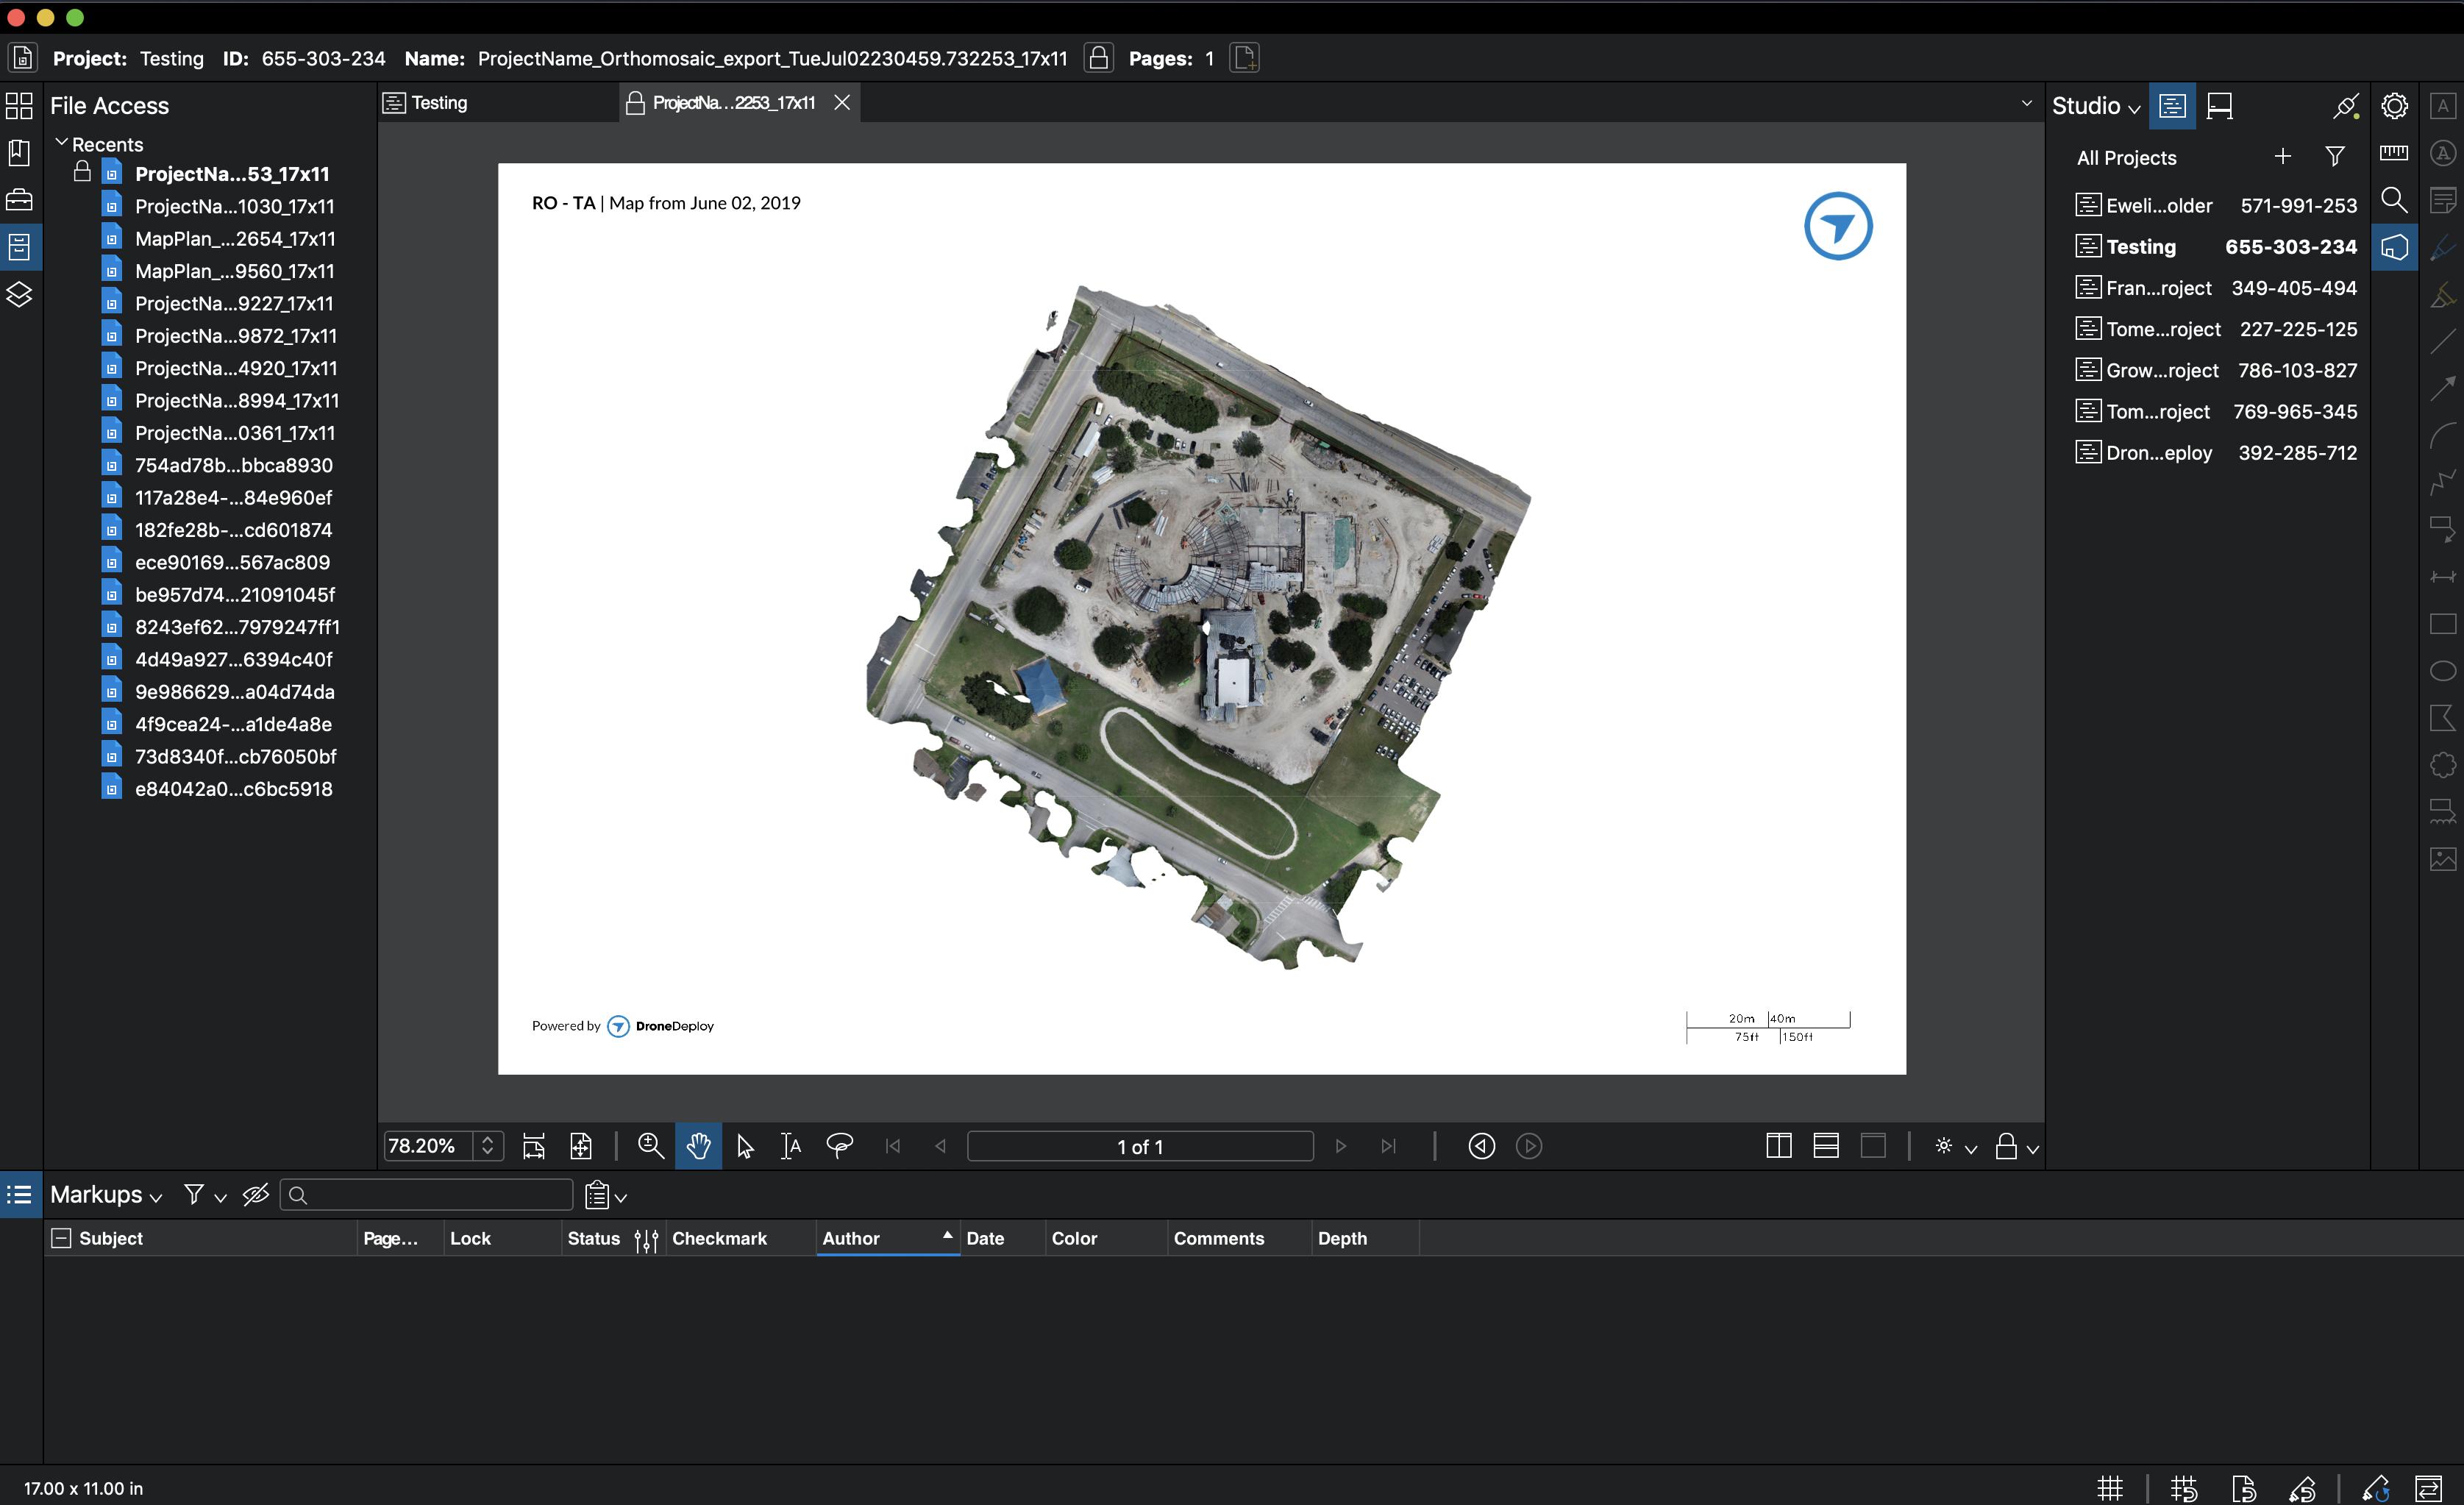 Bluebeam - App Market | DroneDeploy